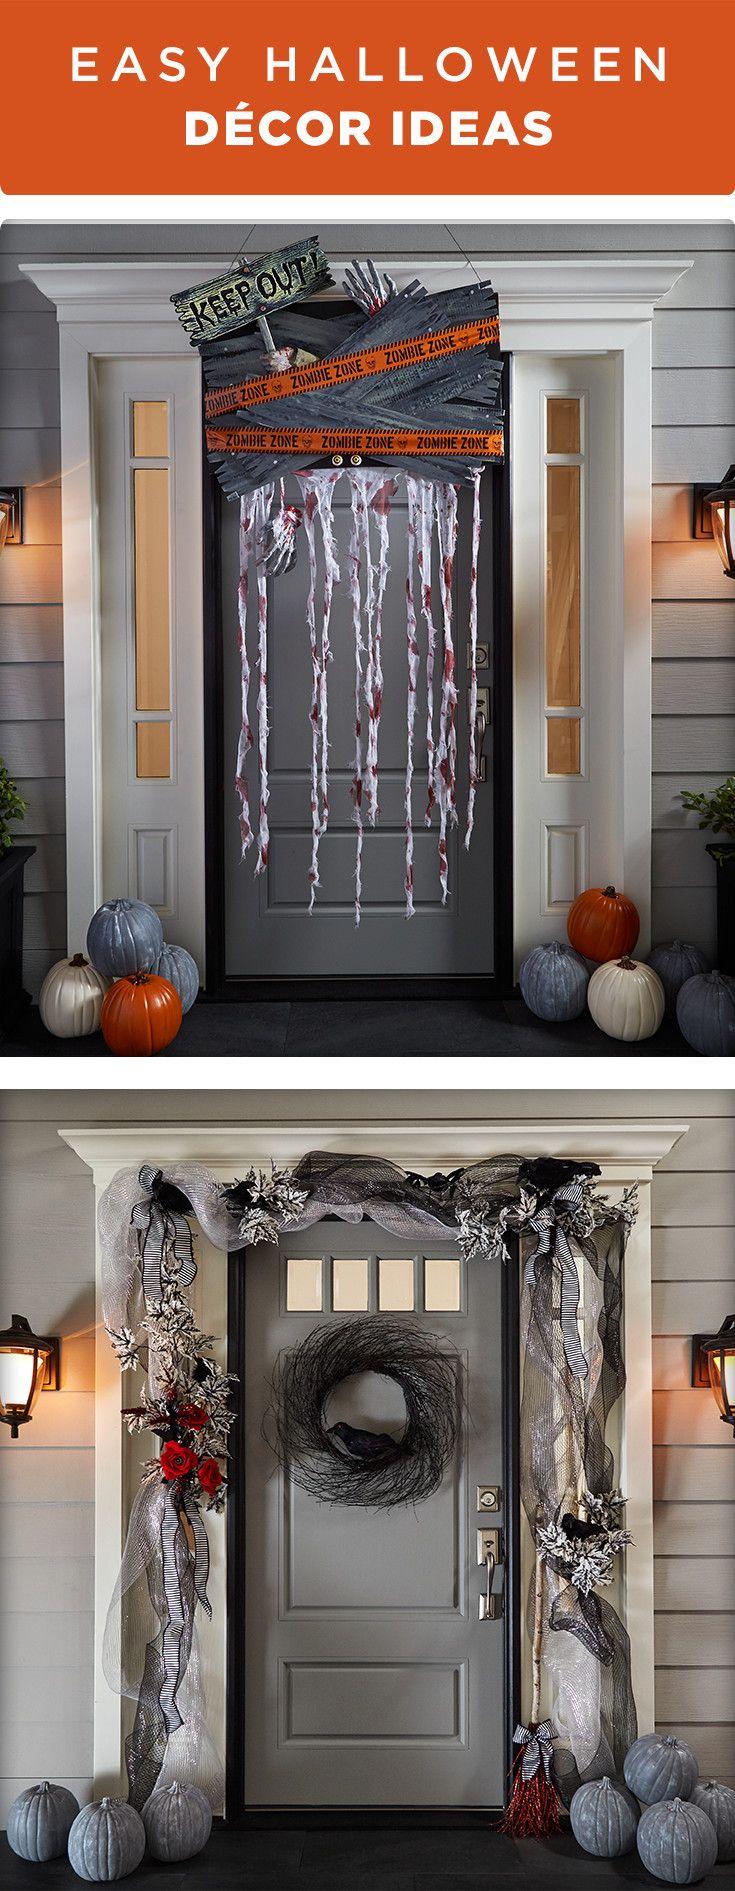 Best 25+ Michaels halloween ideas on Pinterest | Halloween ...